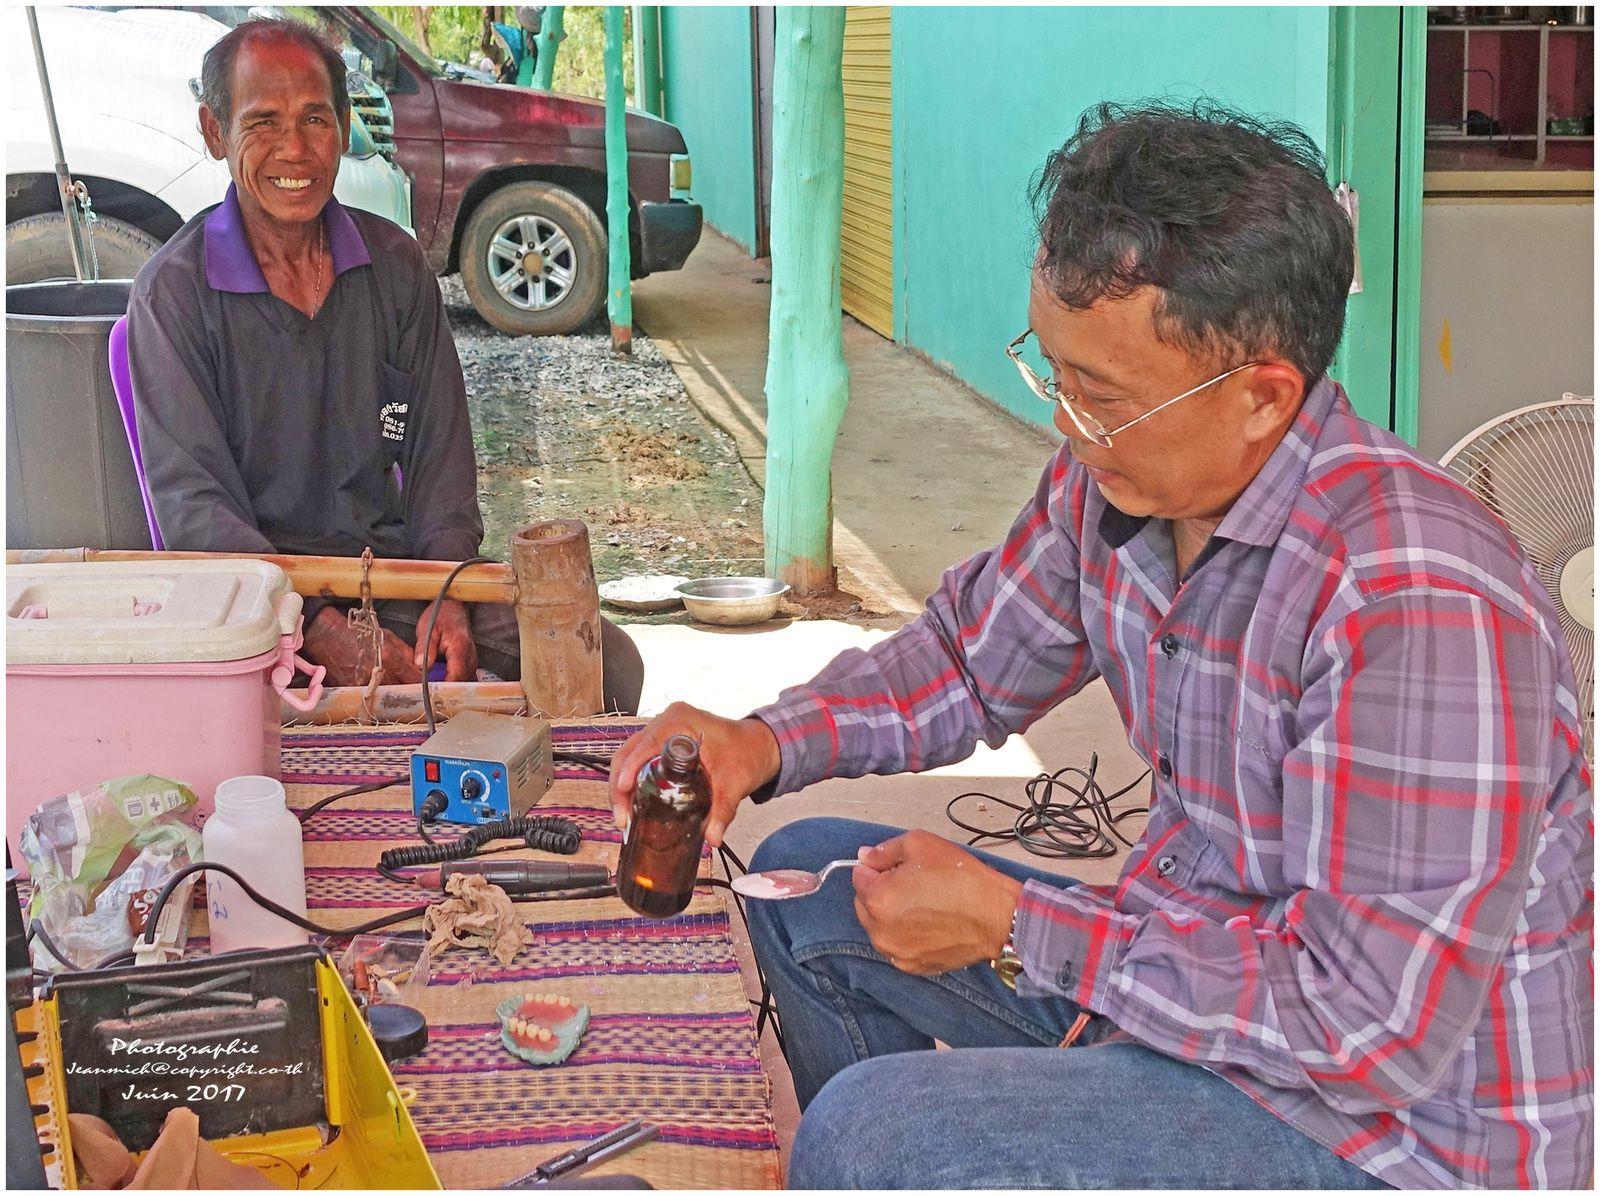 Mécanicien dentiste de rue... (Thaïlande)